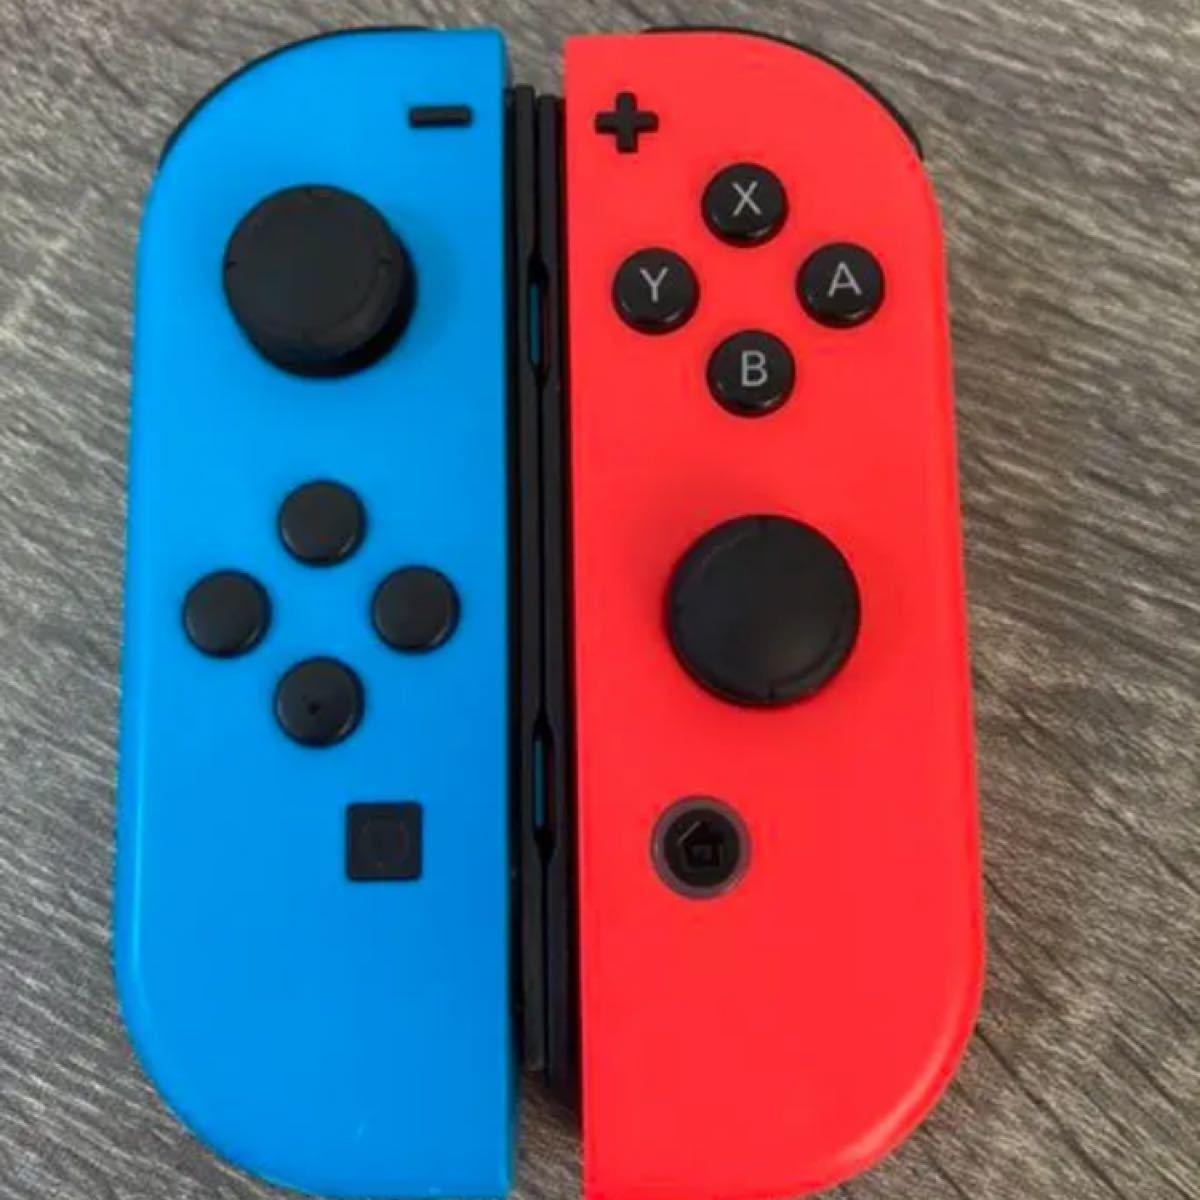 Nintendo Switch ジョイコン joy-con ネオンブルーレッドU